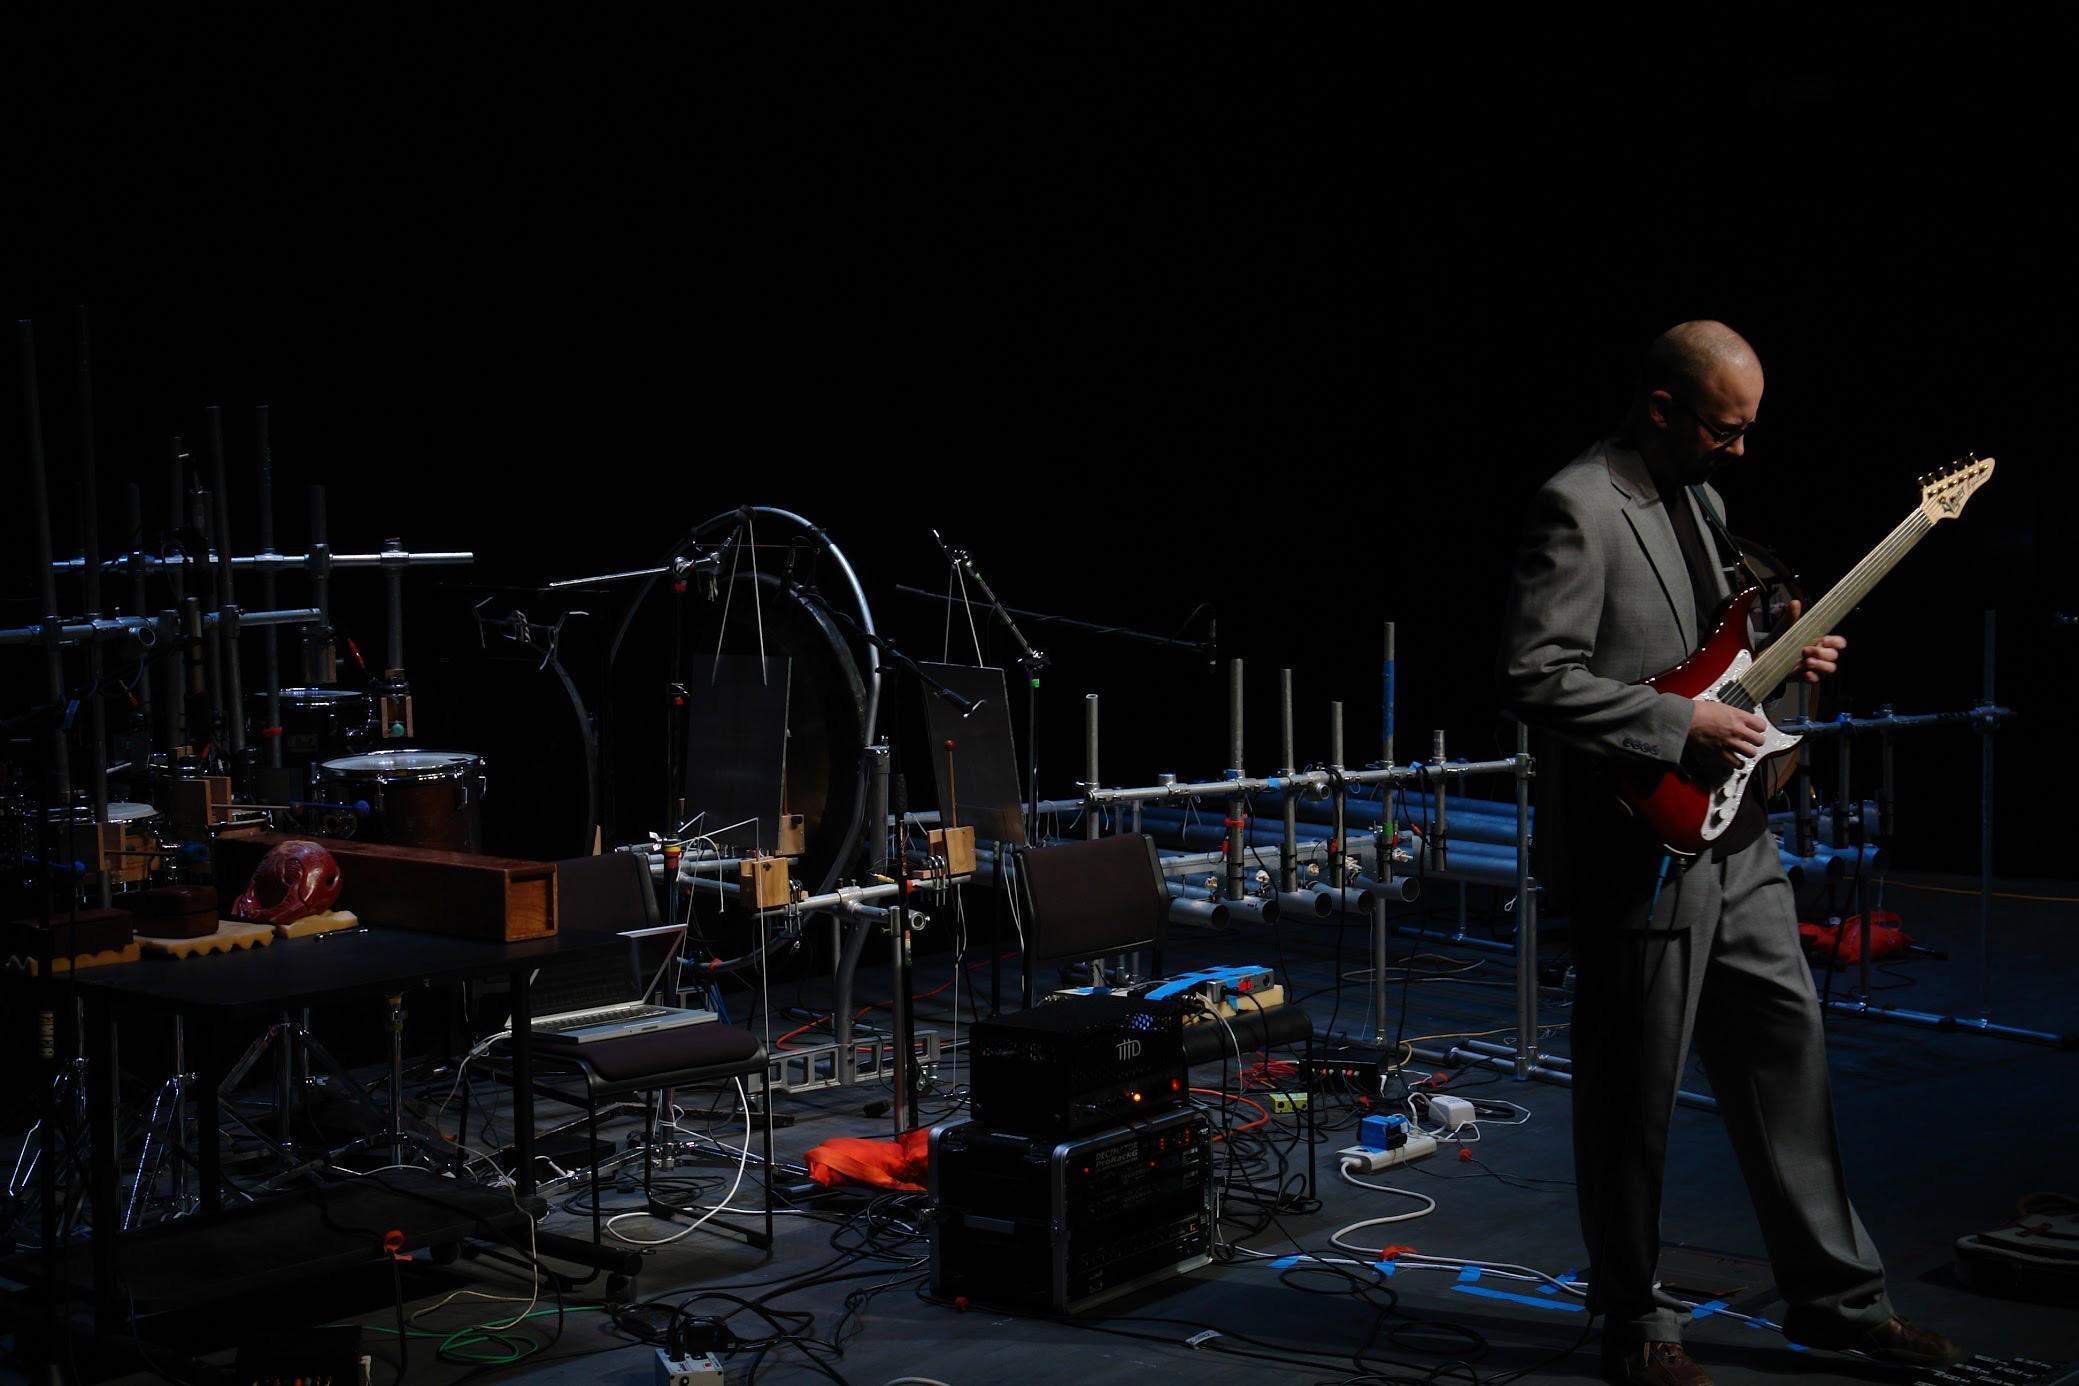 Adam performing with robot percussion array in Duoquadragintapus.